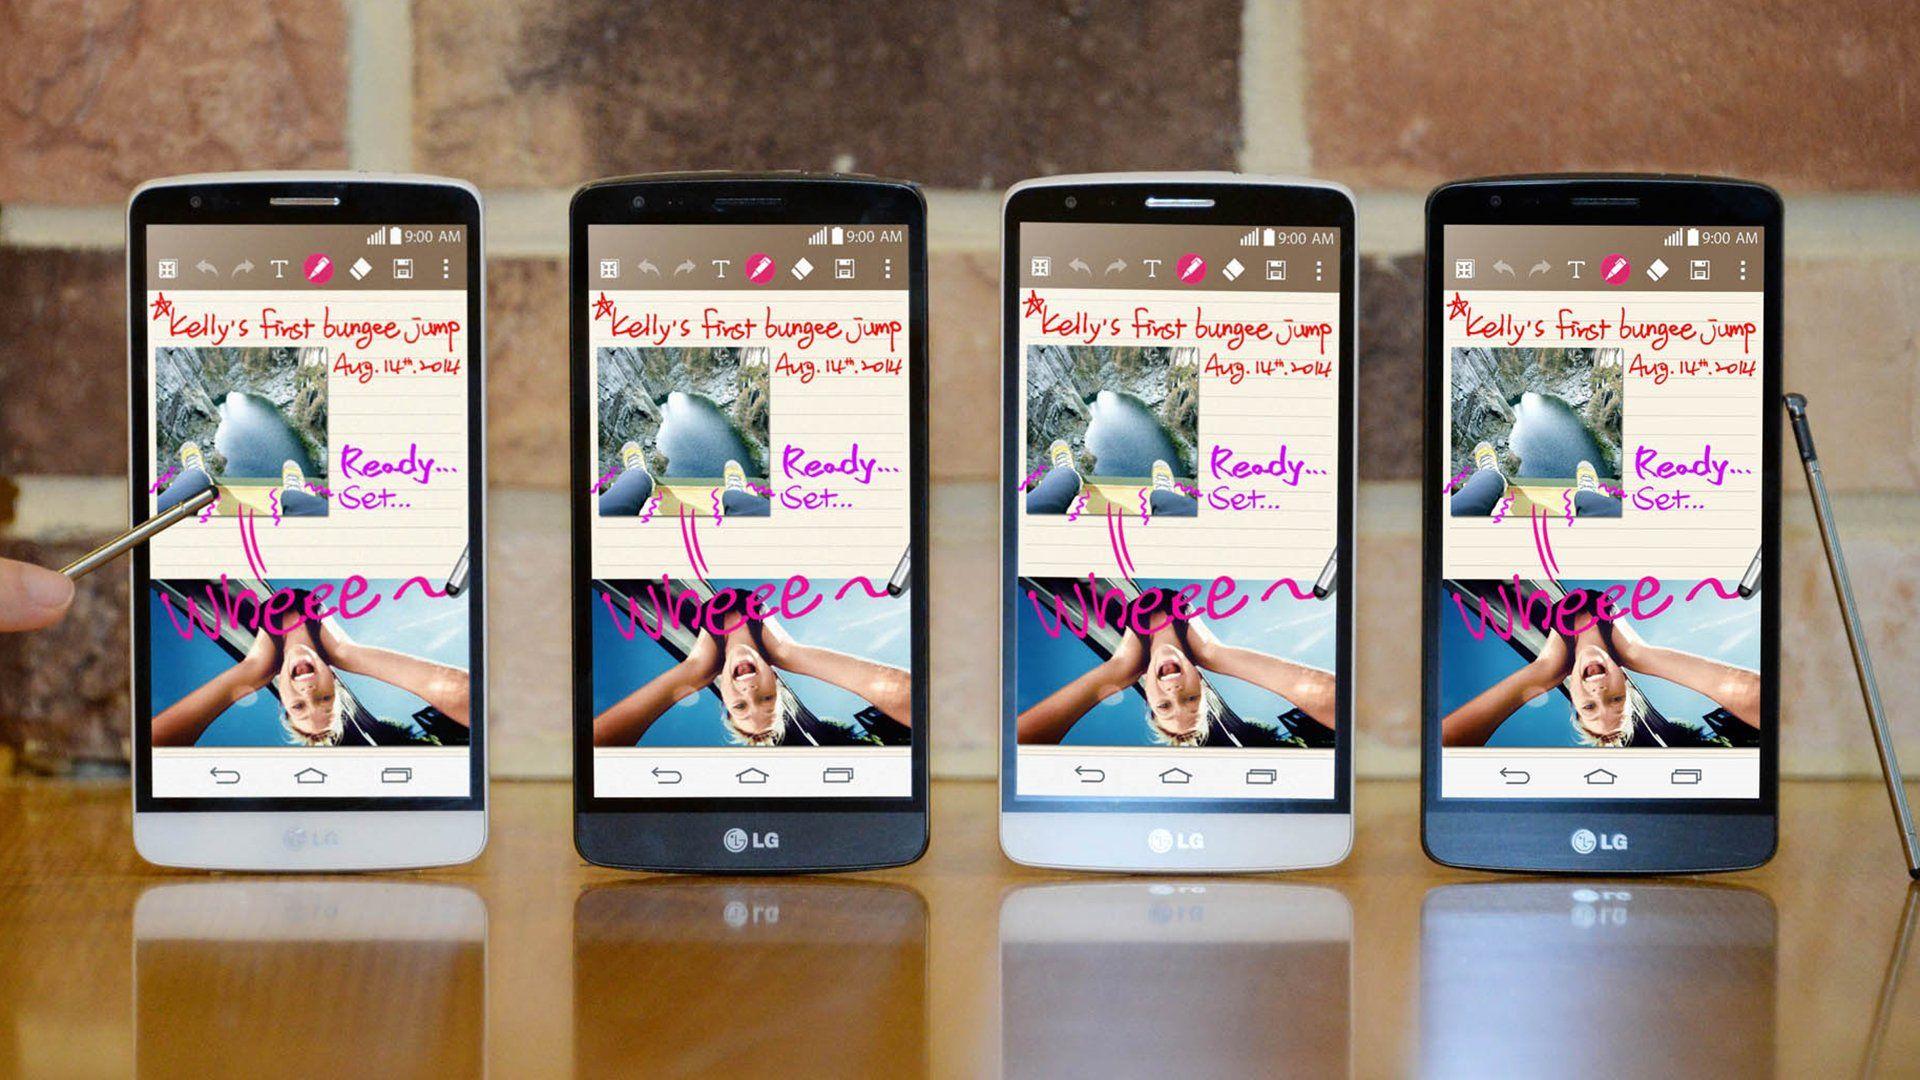 內建觸控筆設計,5.5 吋新機 LG G3 Stylus 即將登場 - http://chinese.vr-zone.com/125167/lg-announces-g3-stylus-with-5-5-inch-display-and-stylus-pen-08262014/